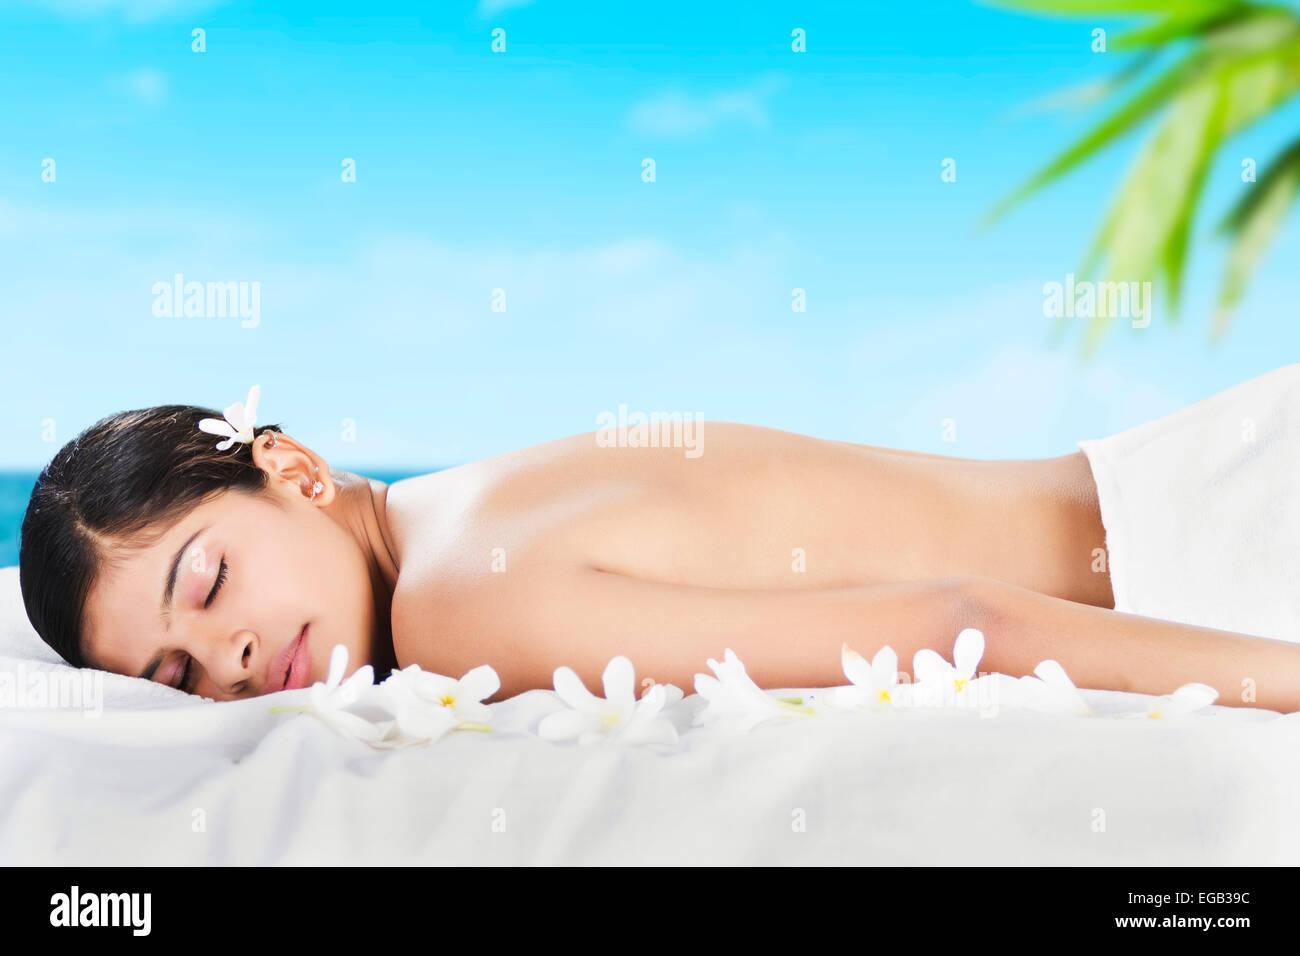 gratis porrbilder spa massage göteborg